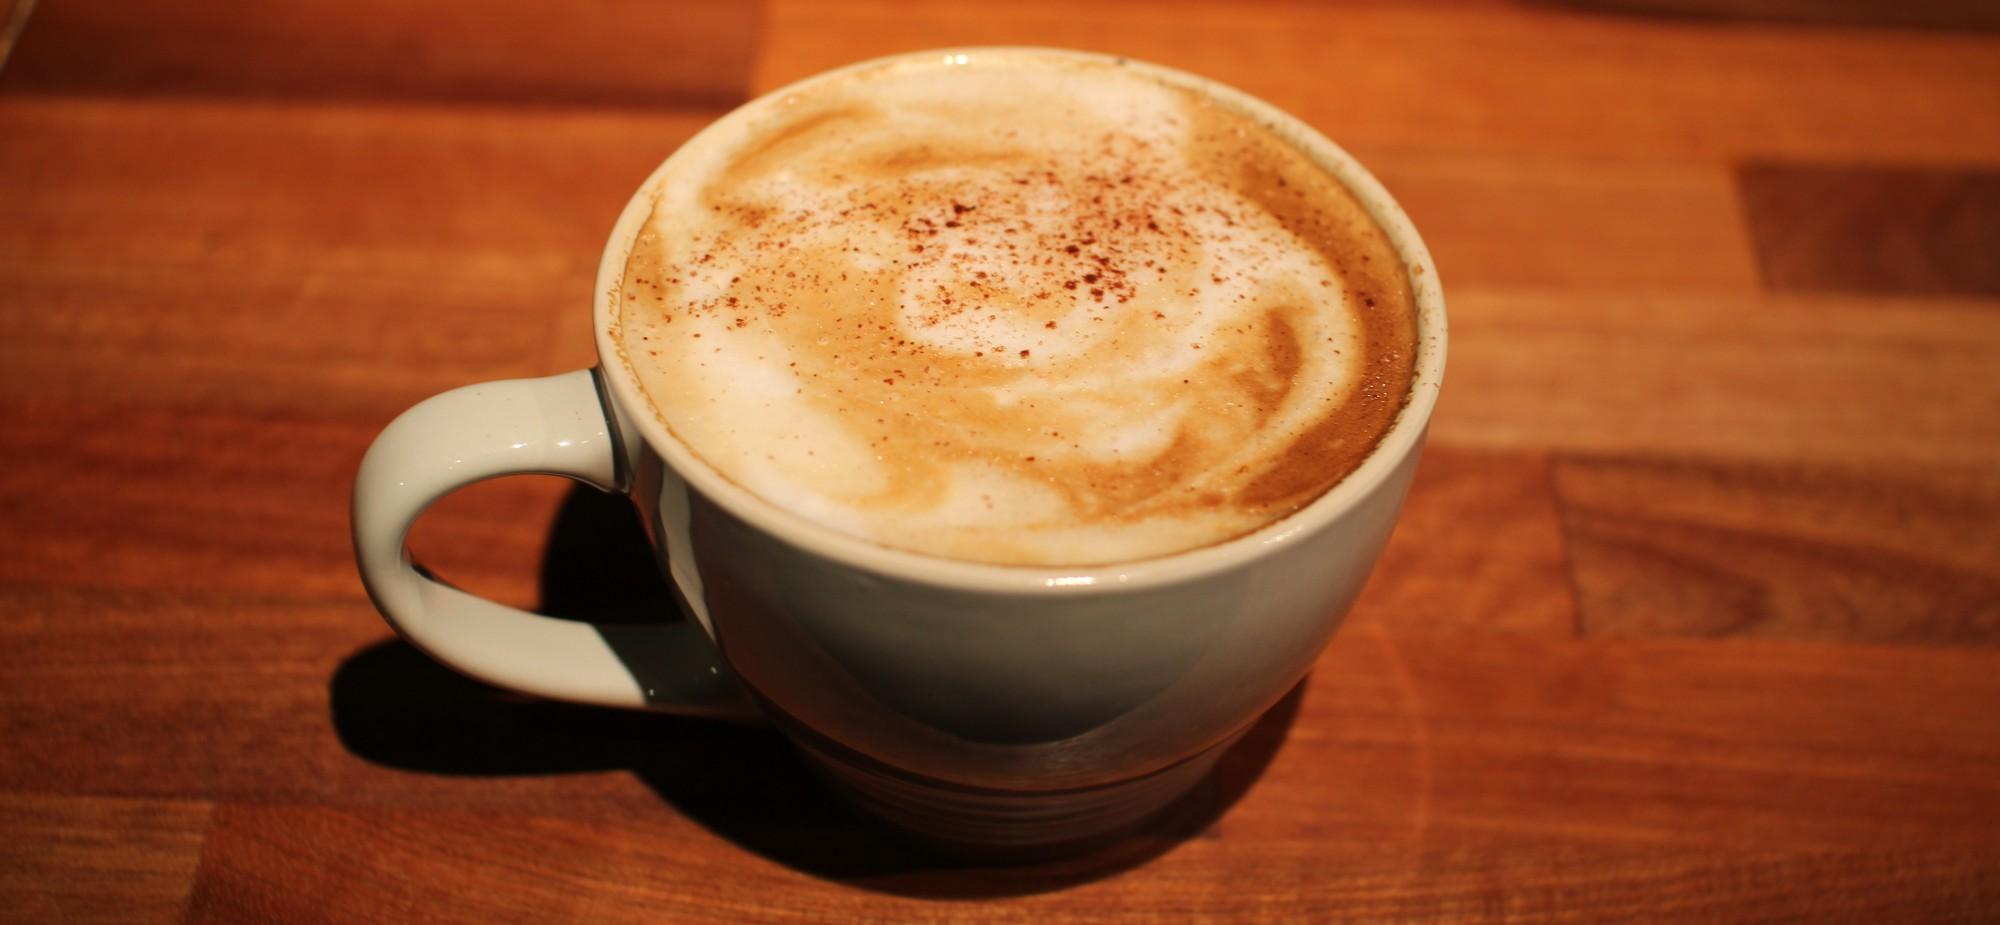 Denperfektkaffefinal